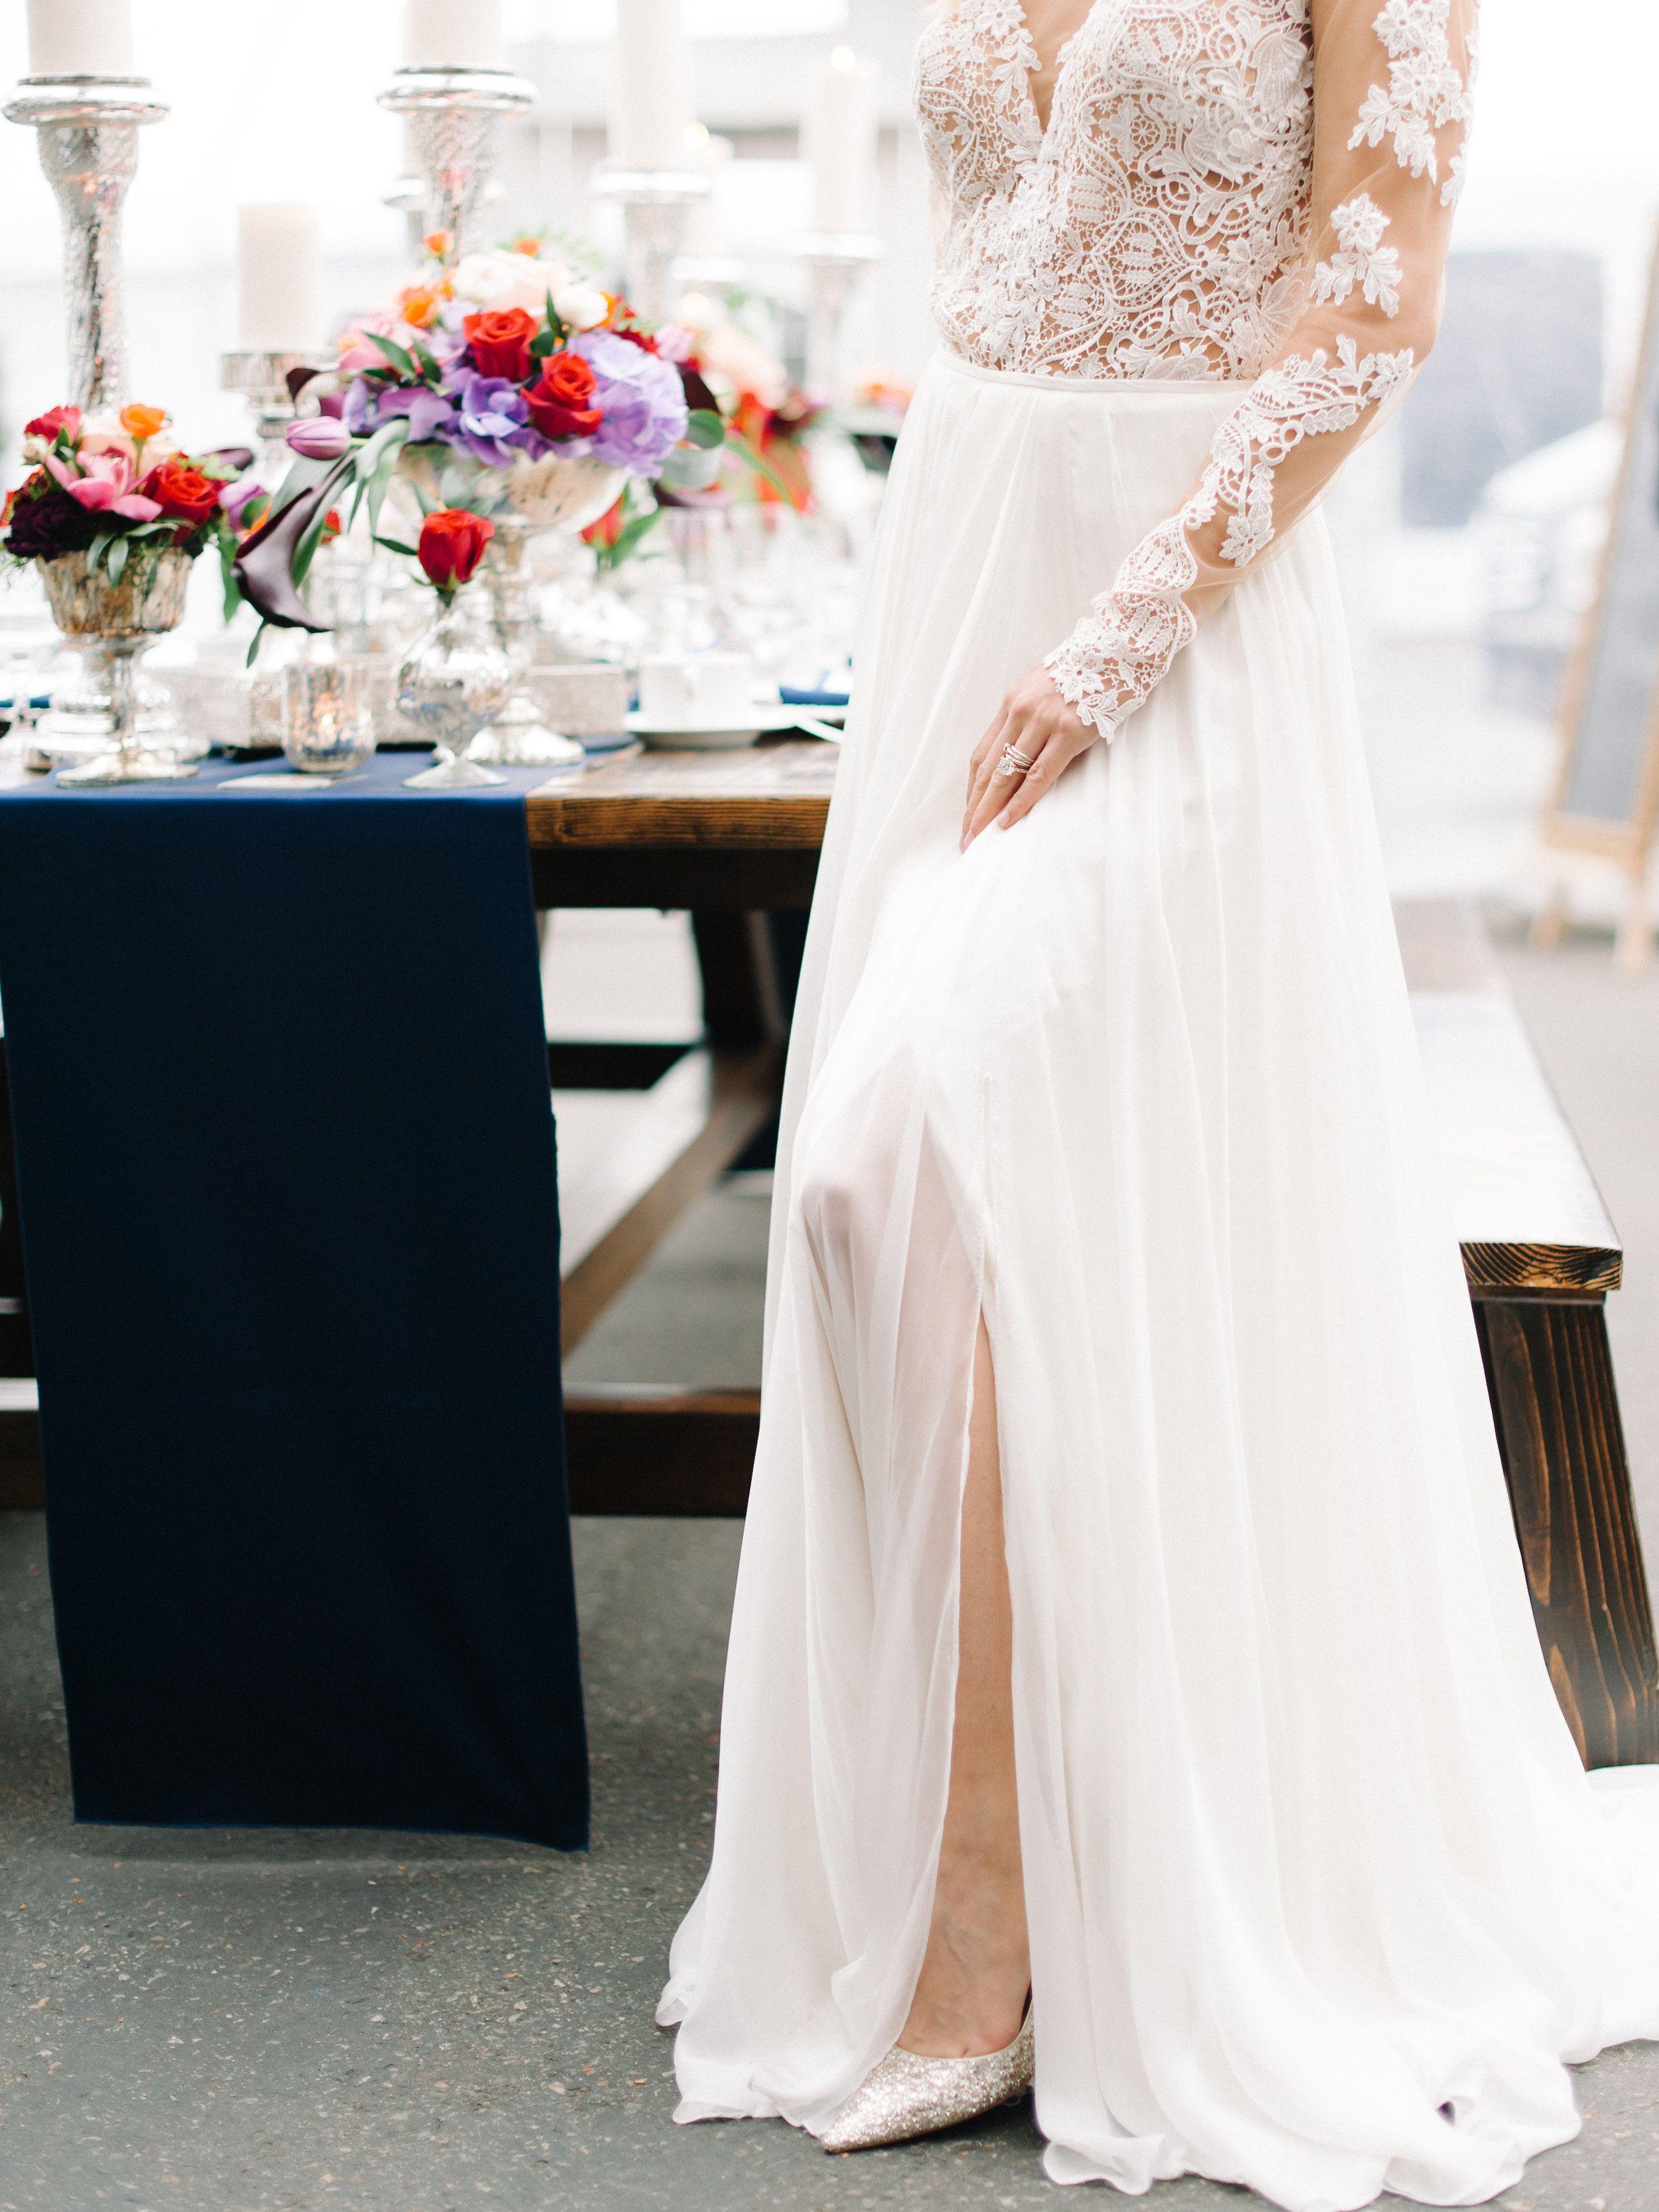 Songbird Wedding   Romance, Wedding and Weddings